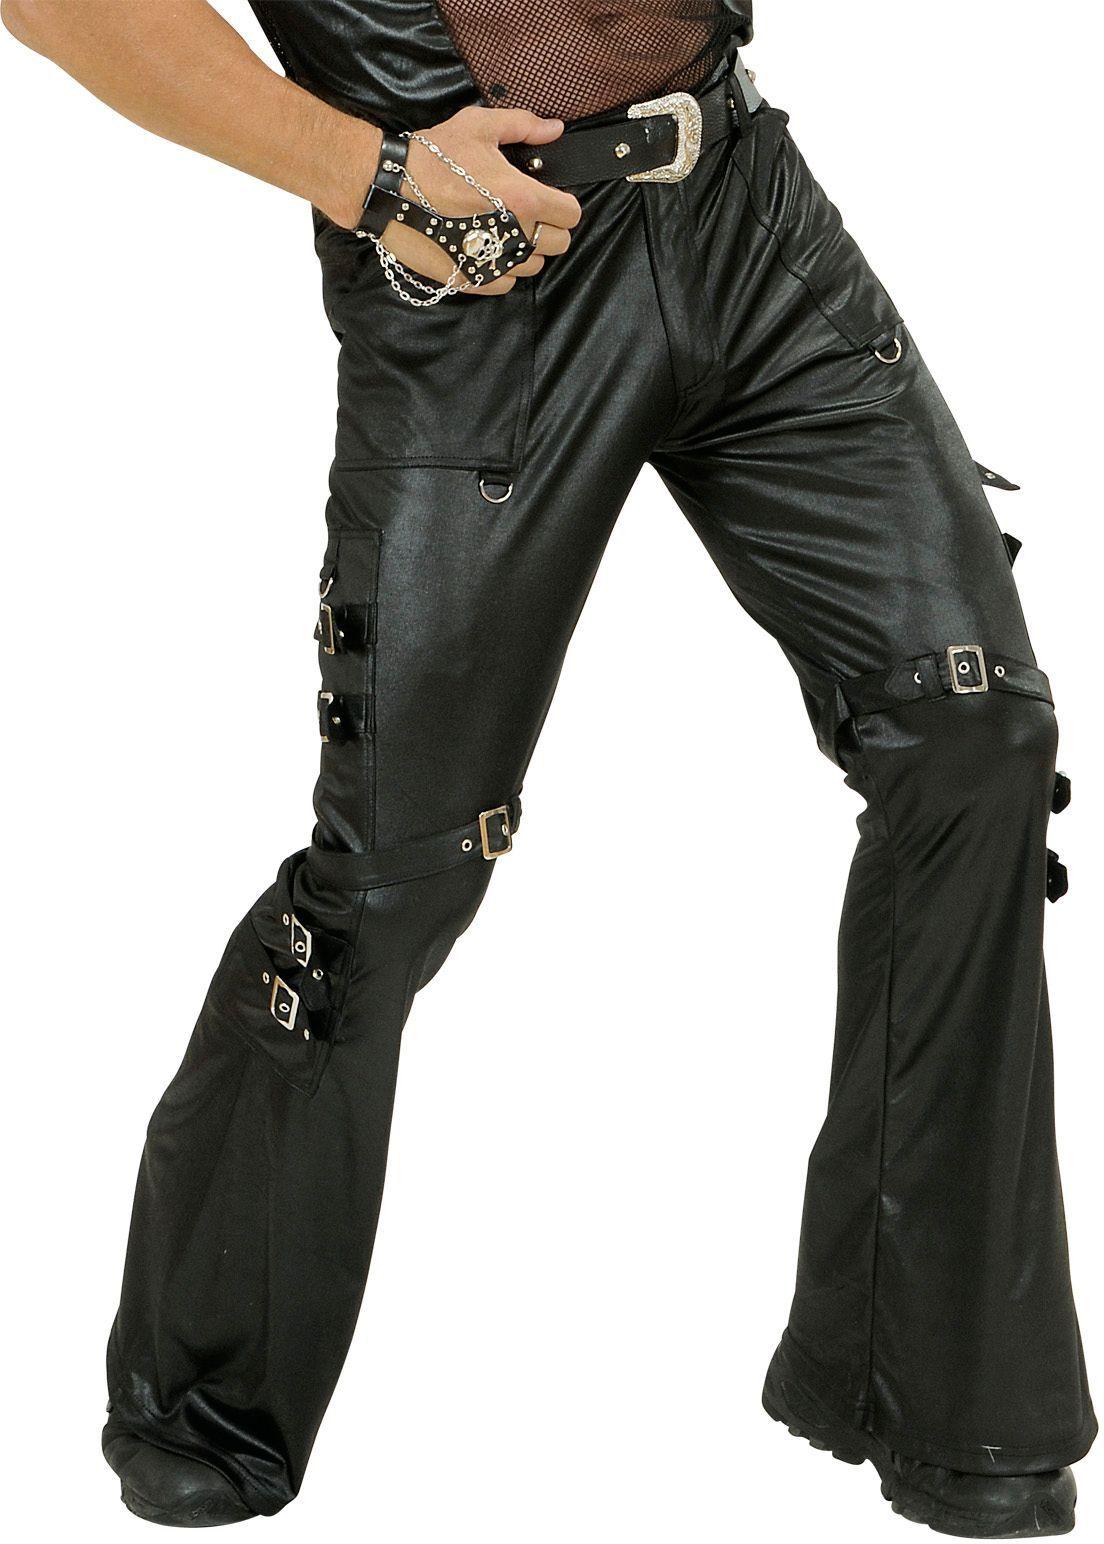 Rockster broek